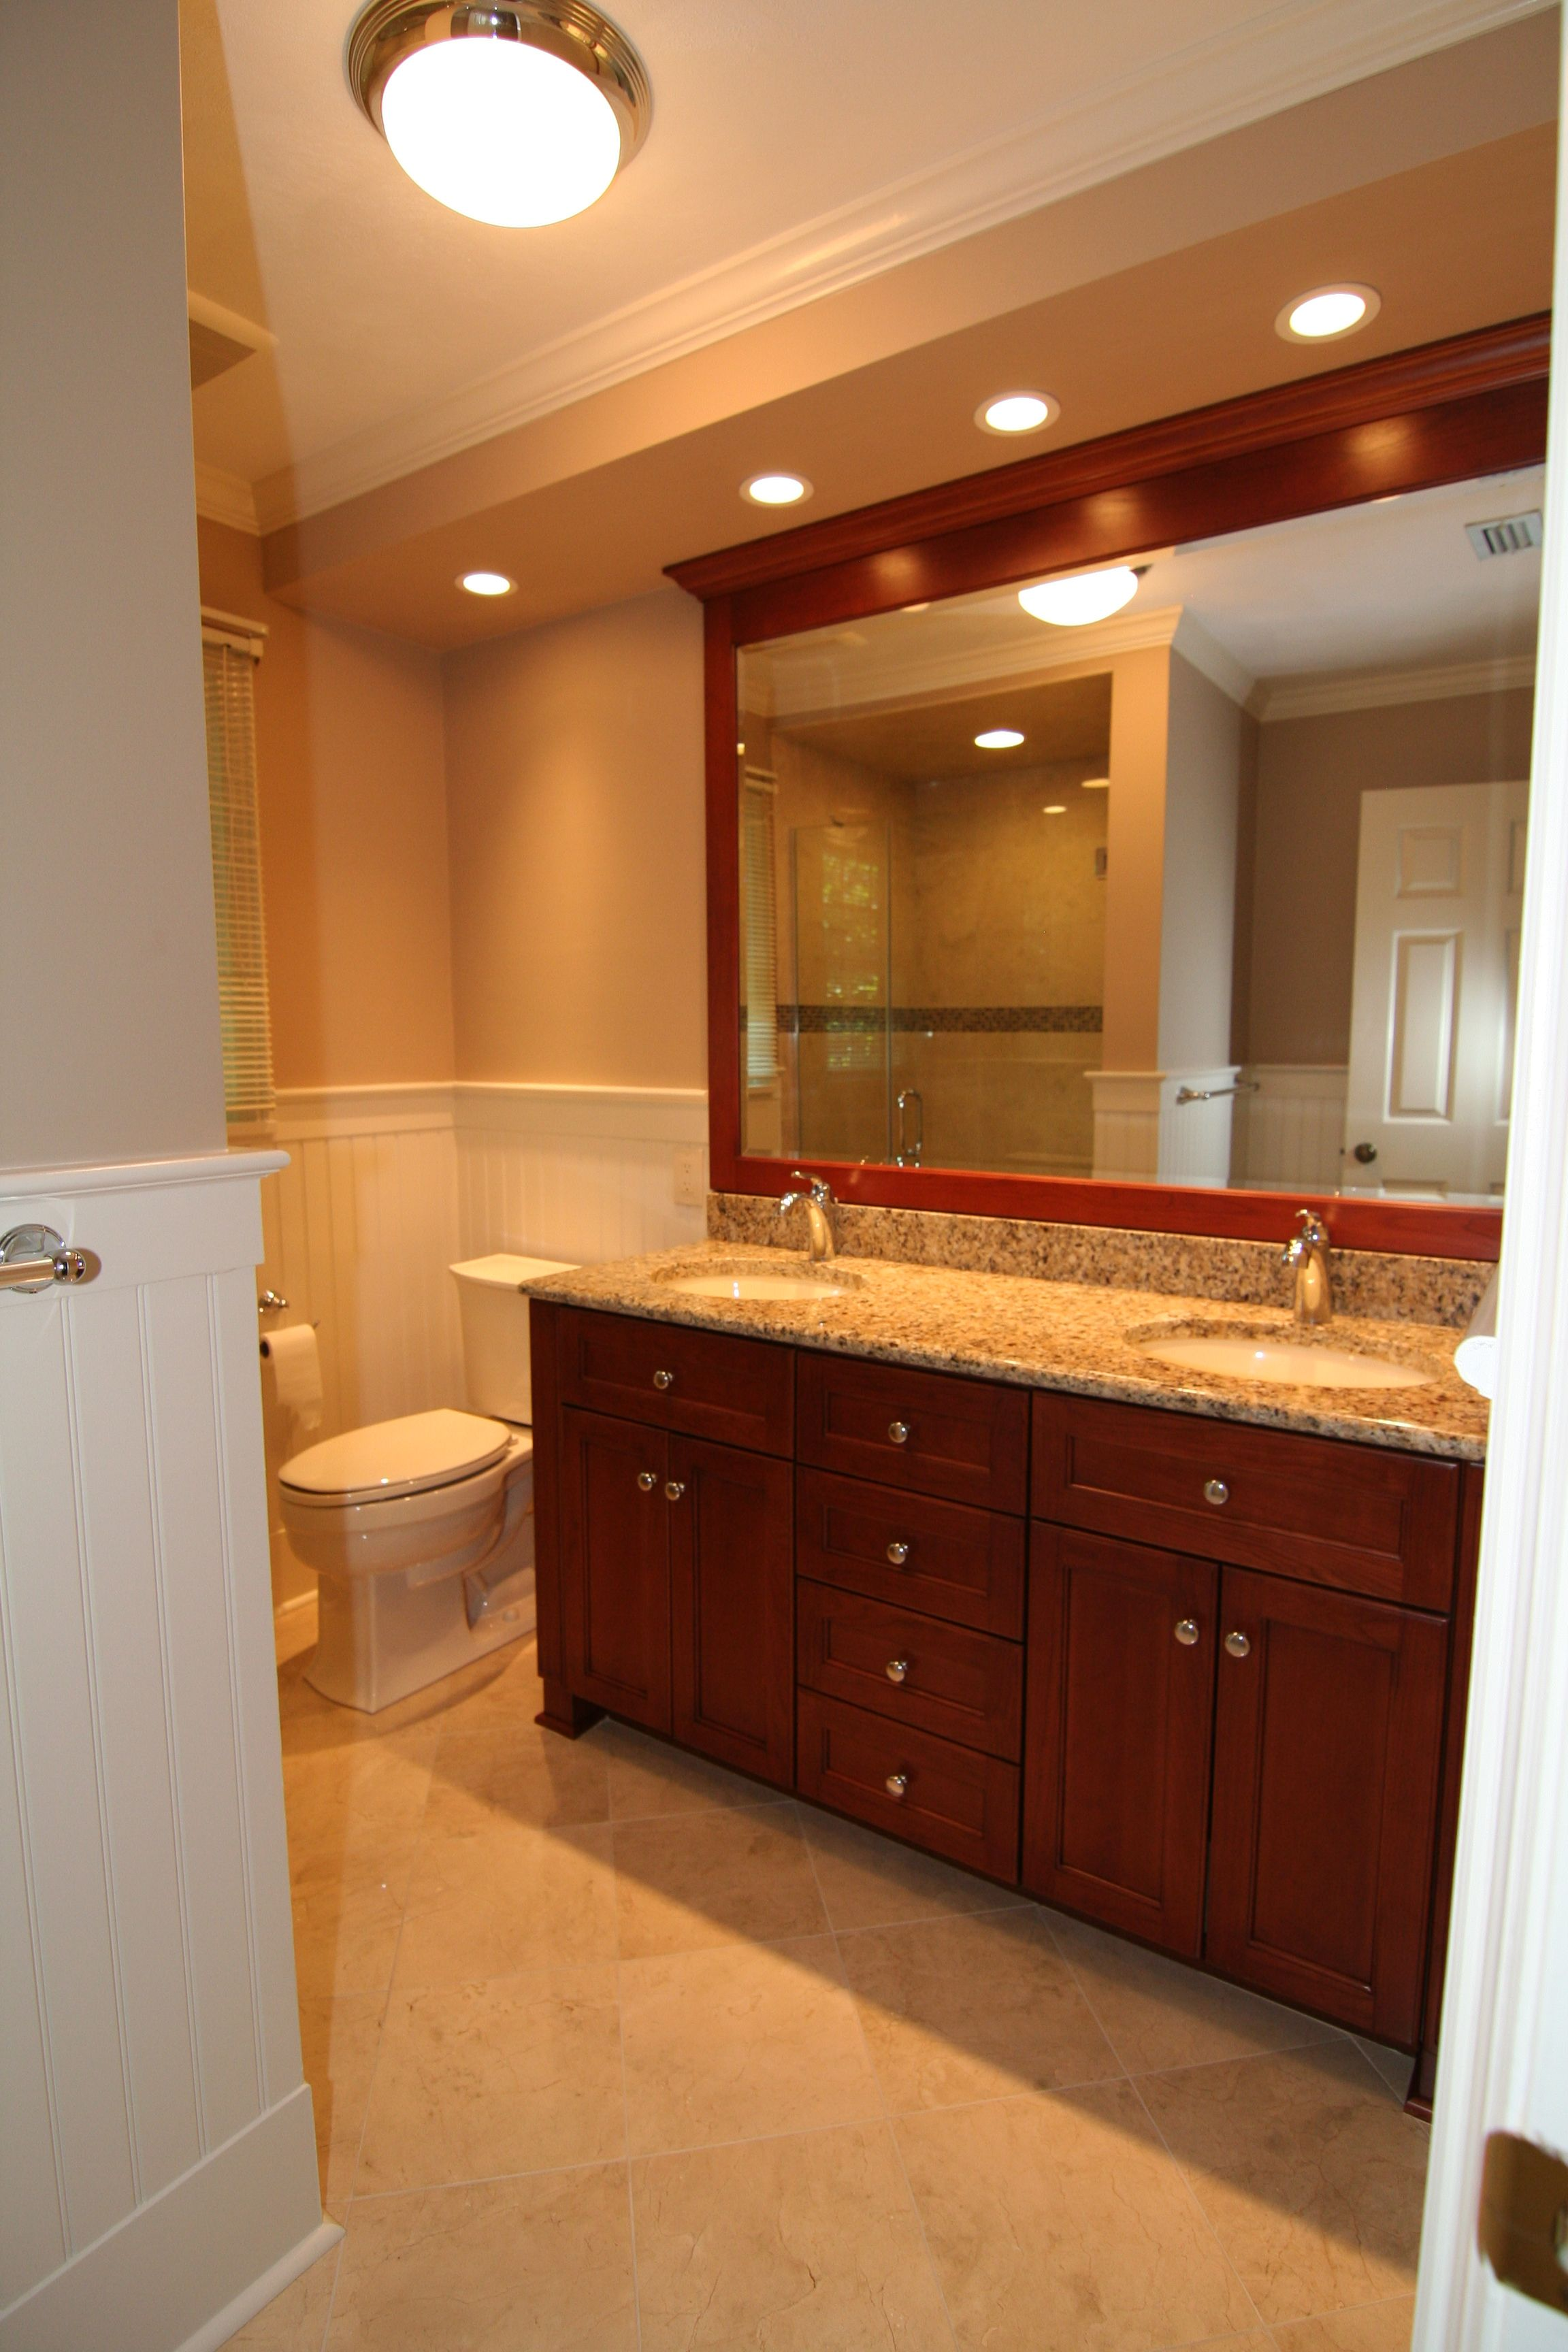 Bathroom Remodel Jack And Jill Sinks Cream Colored Stone Countertops